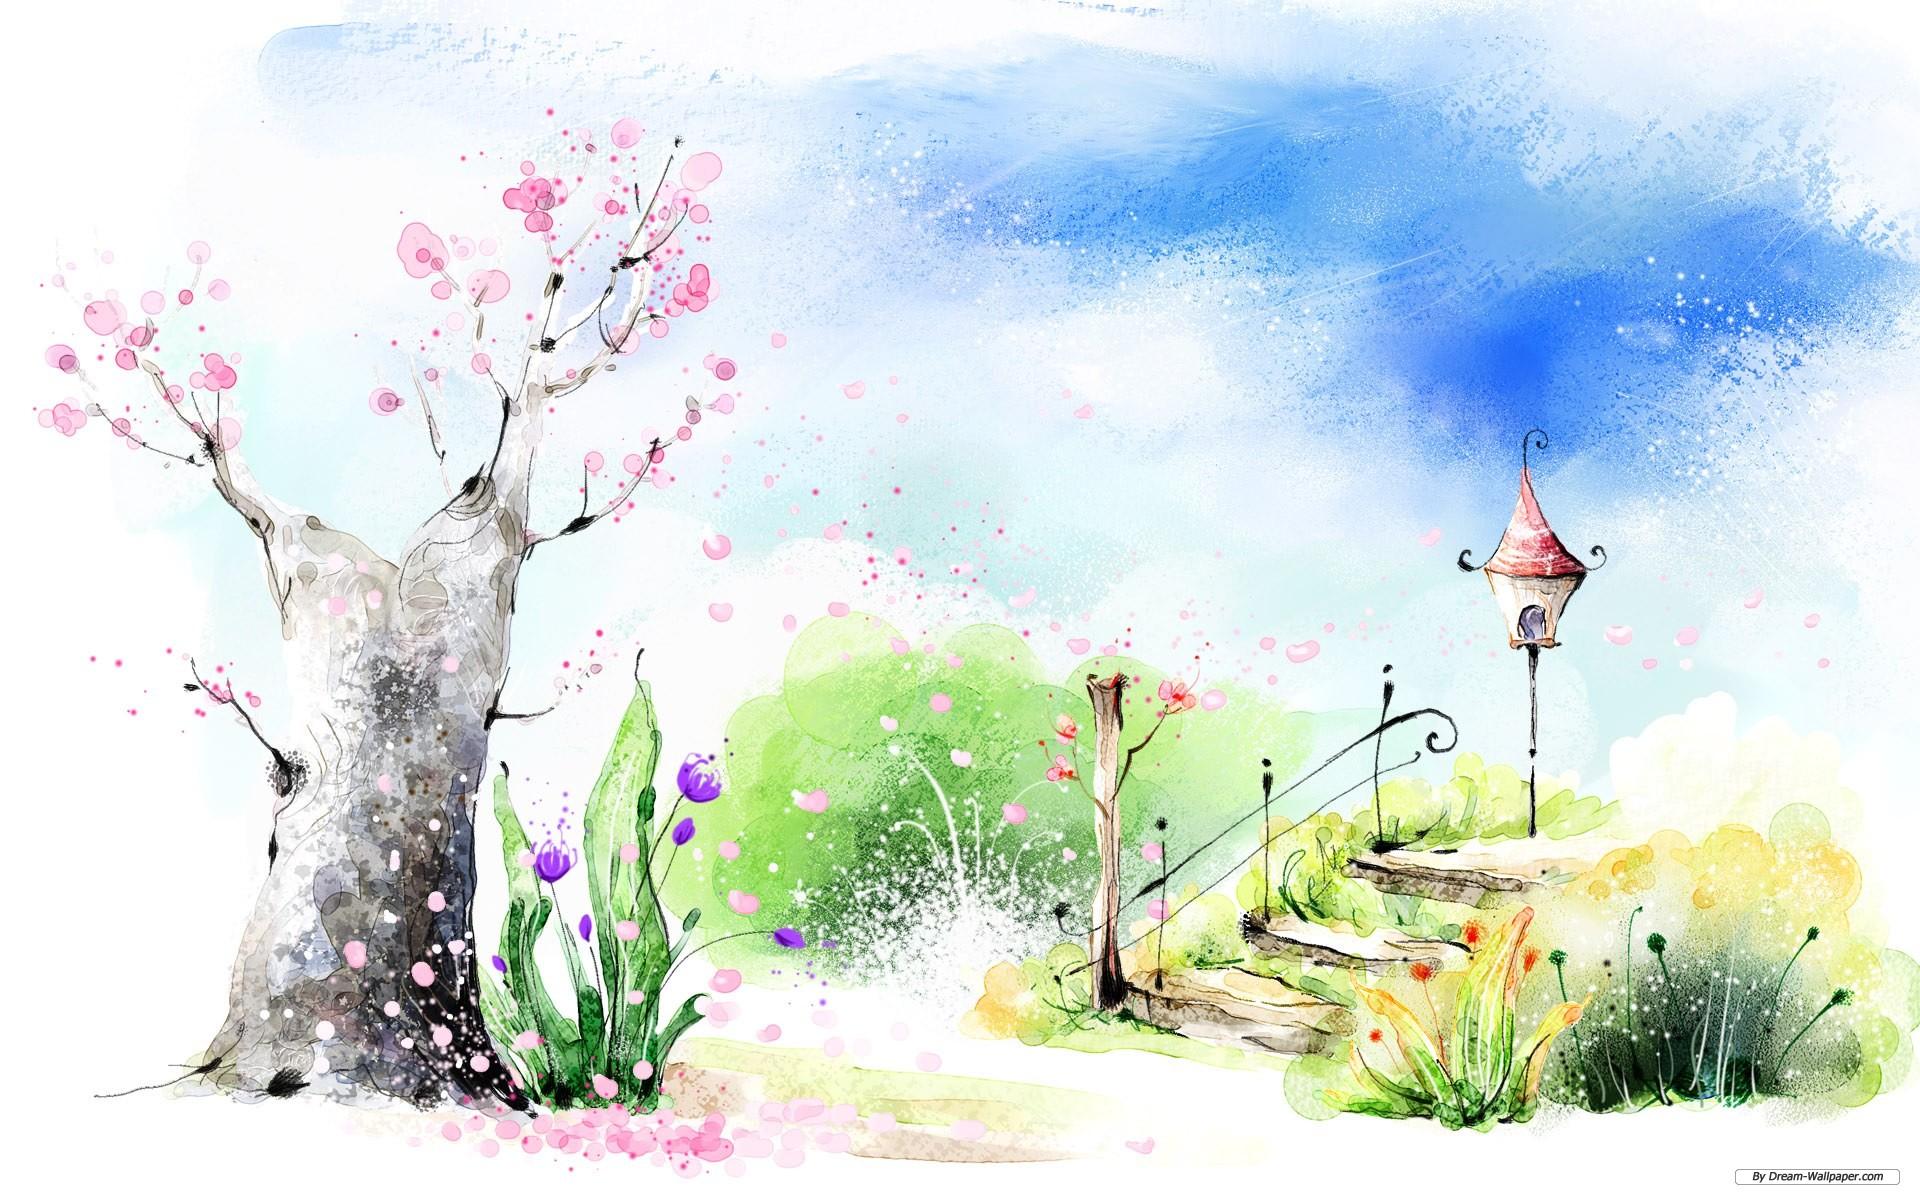 Drawn wallpaper scenery Drawing Drawing beautiful Scenery drawings